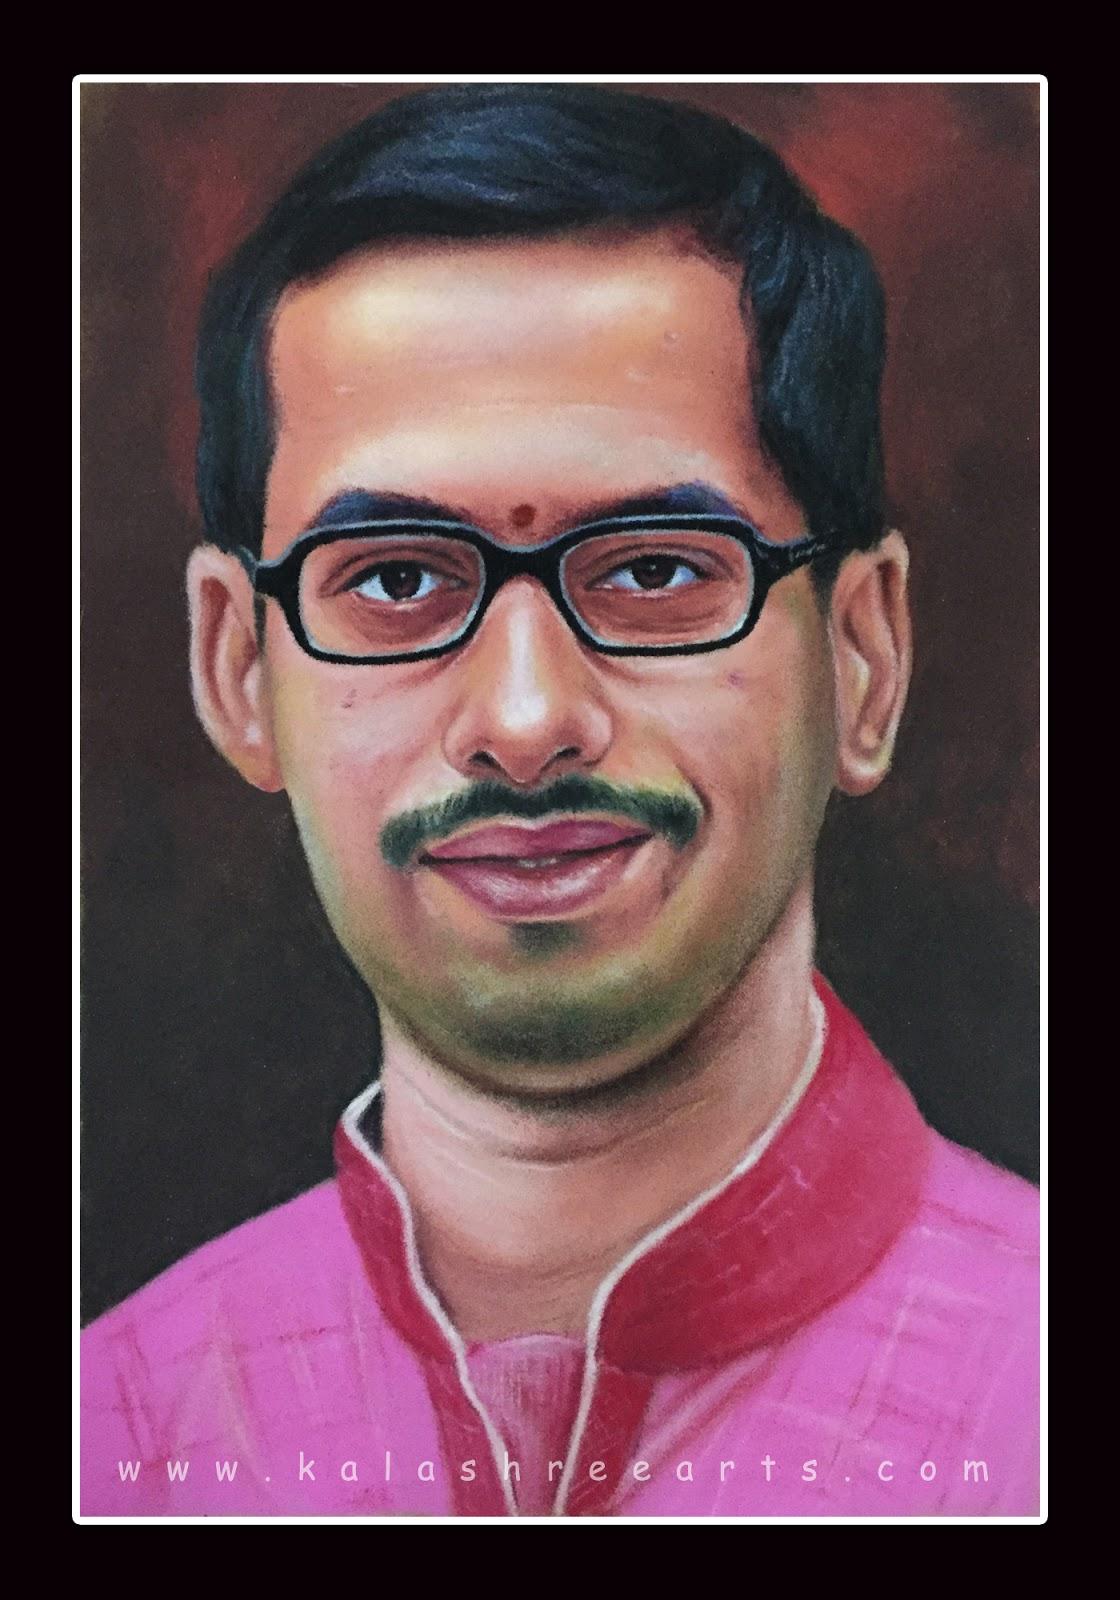 self portrait rangoli design by kalashreearts